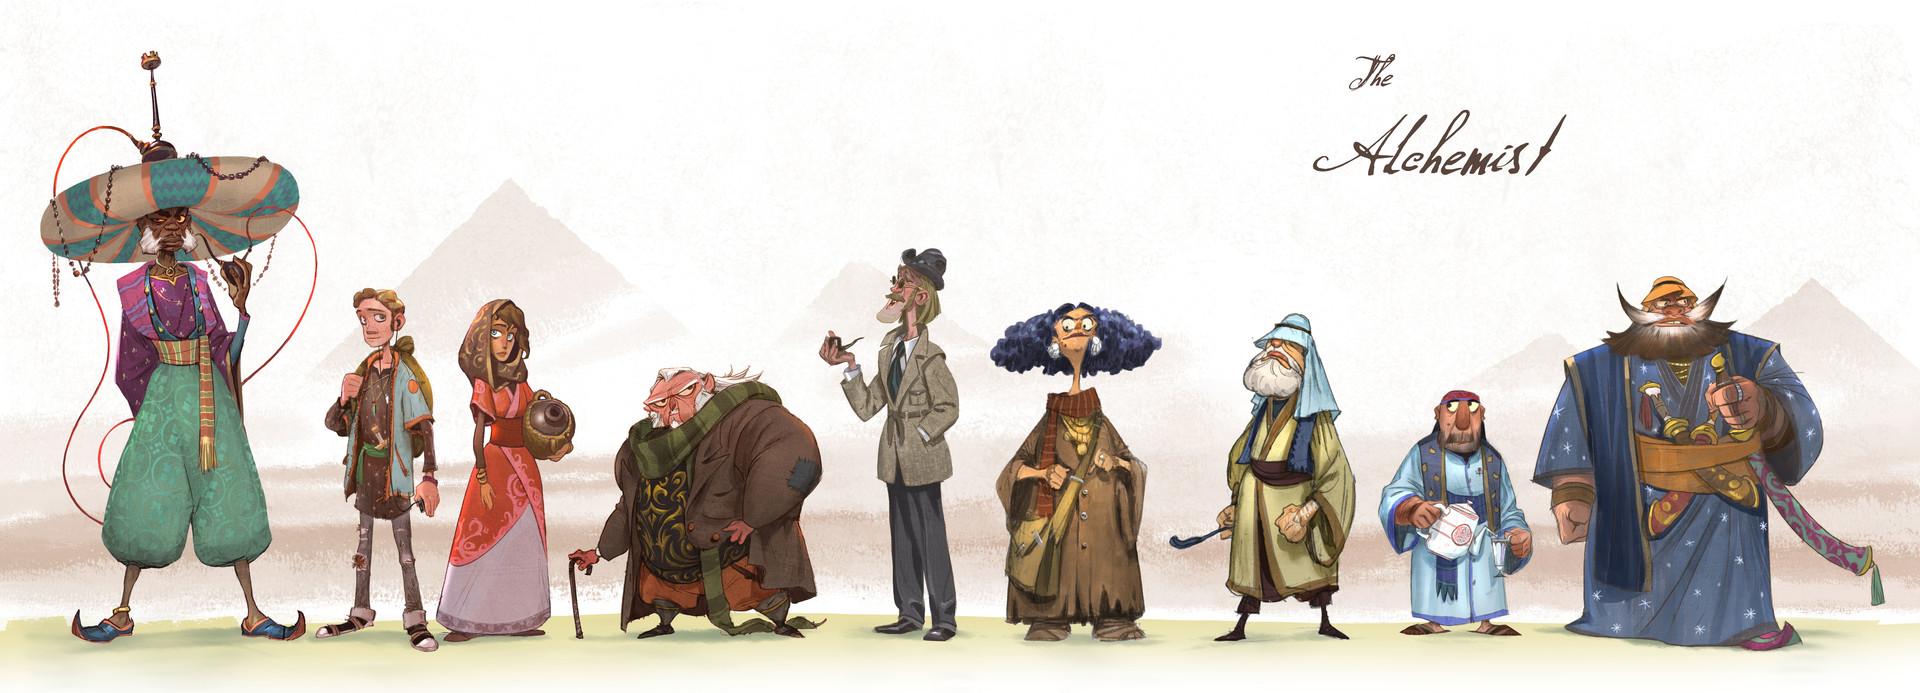 Rustam hasanov rustam hasanov alchemist characters 2